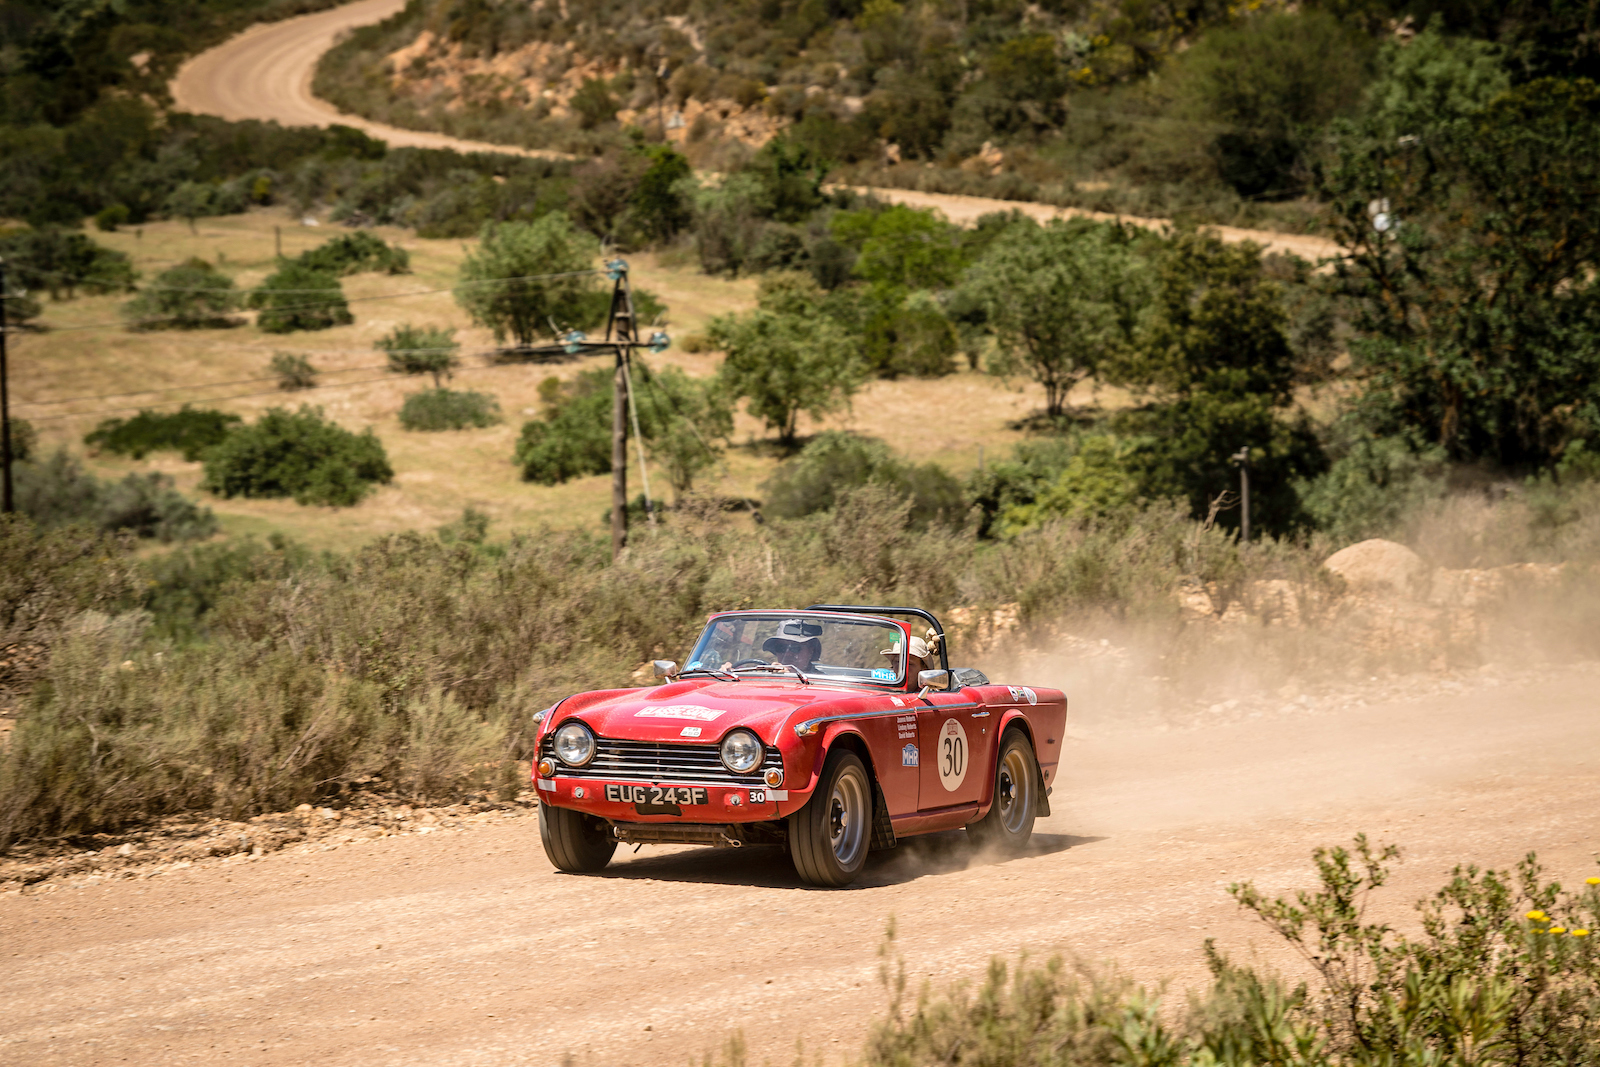 Rally the Globe revs up for Southern Cross Safari